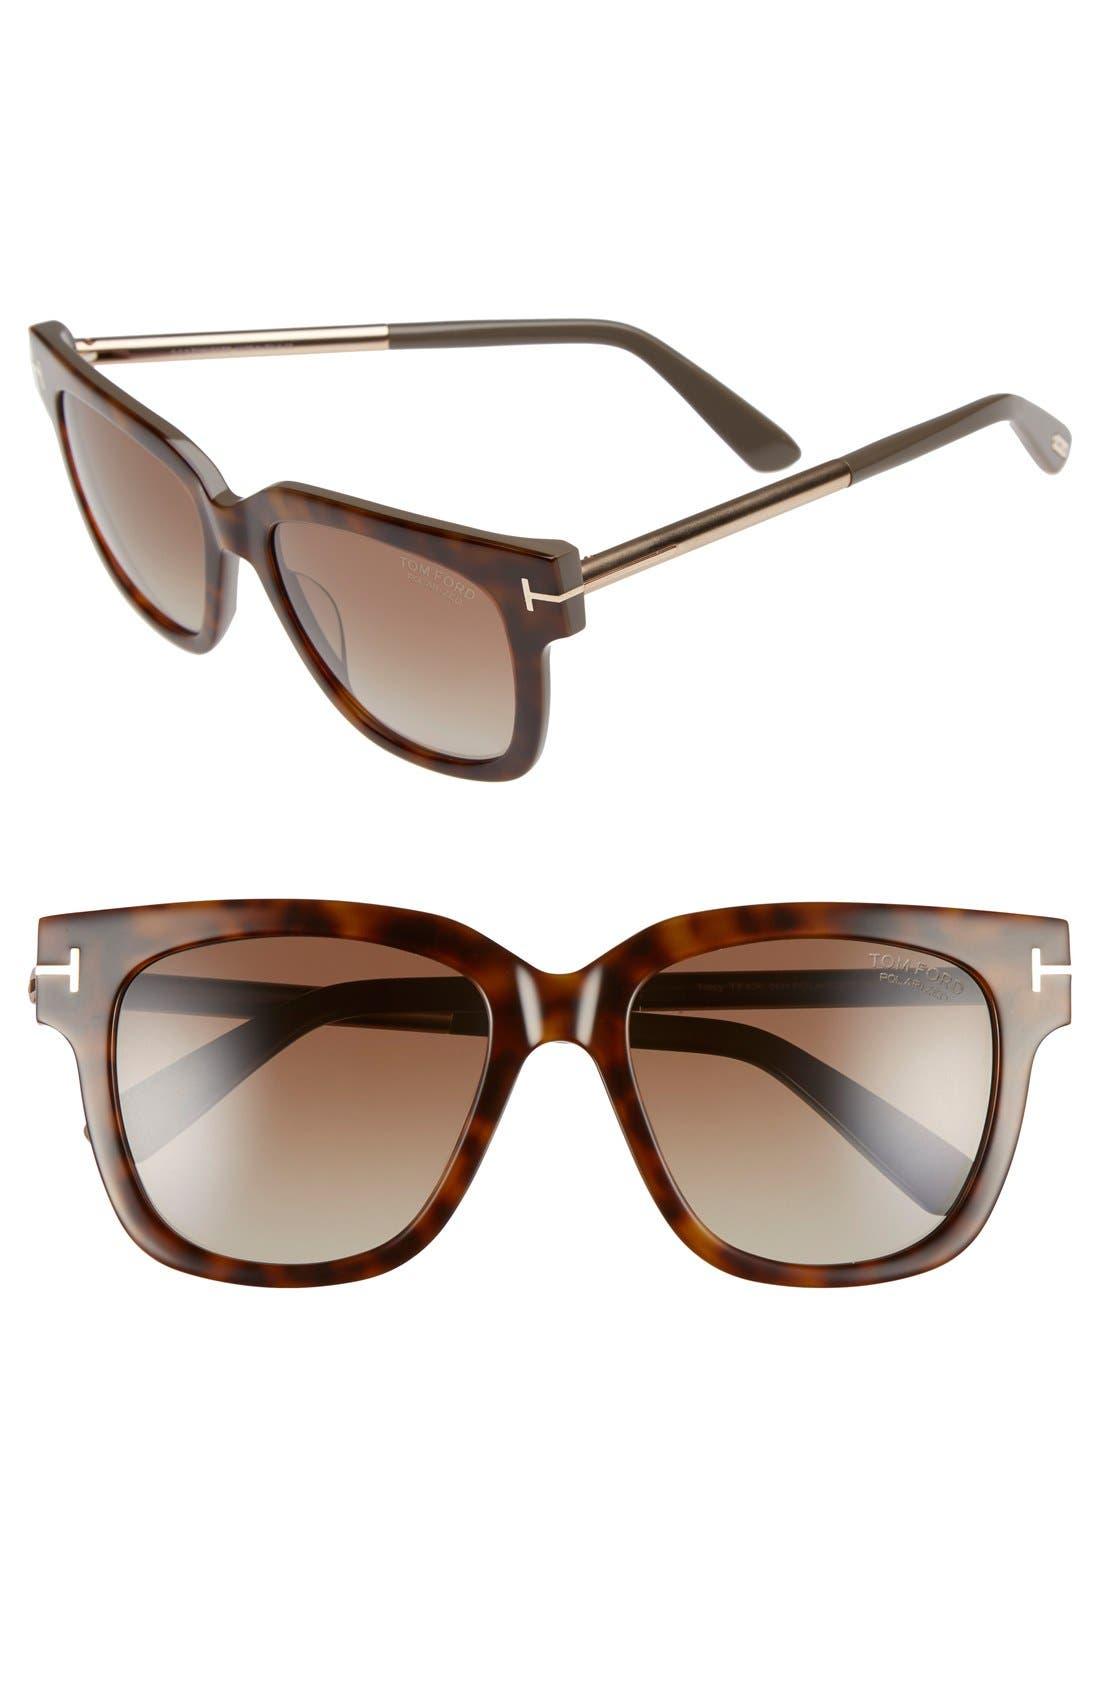 'Tracy' 53mm Retro Sunglasses,                             Main thumbnail 1, color,                             Havana/ Brown Polarized